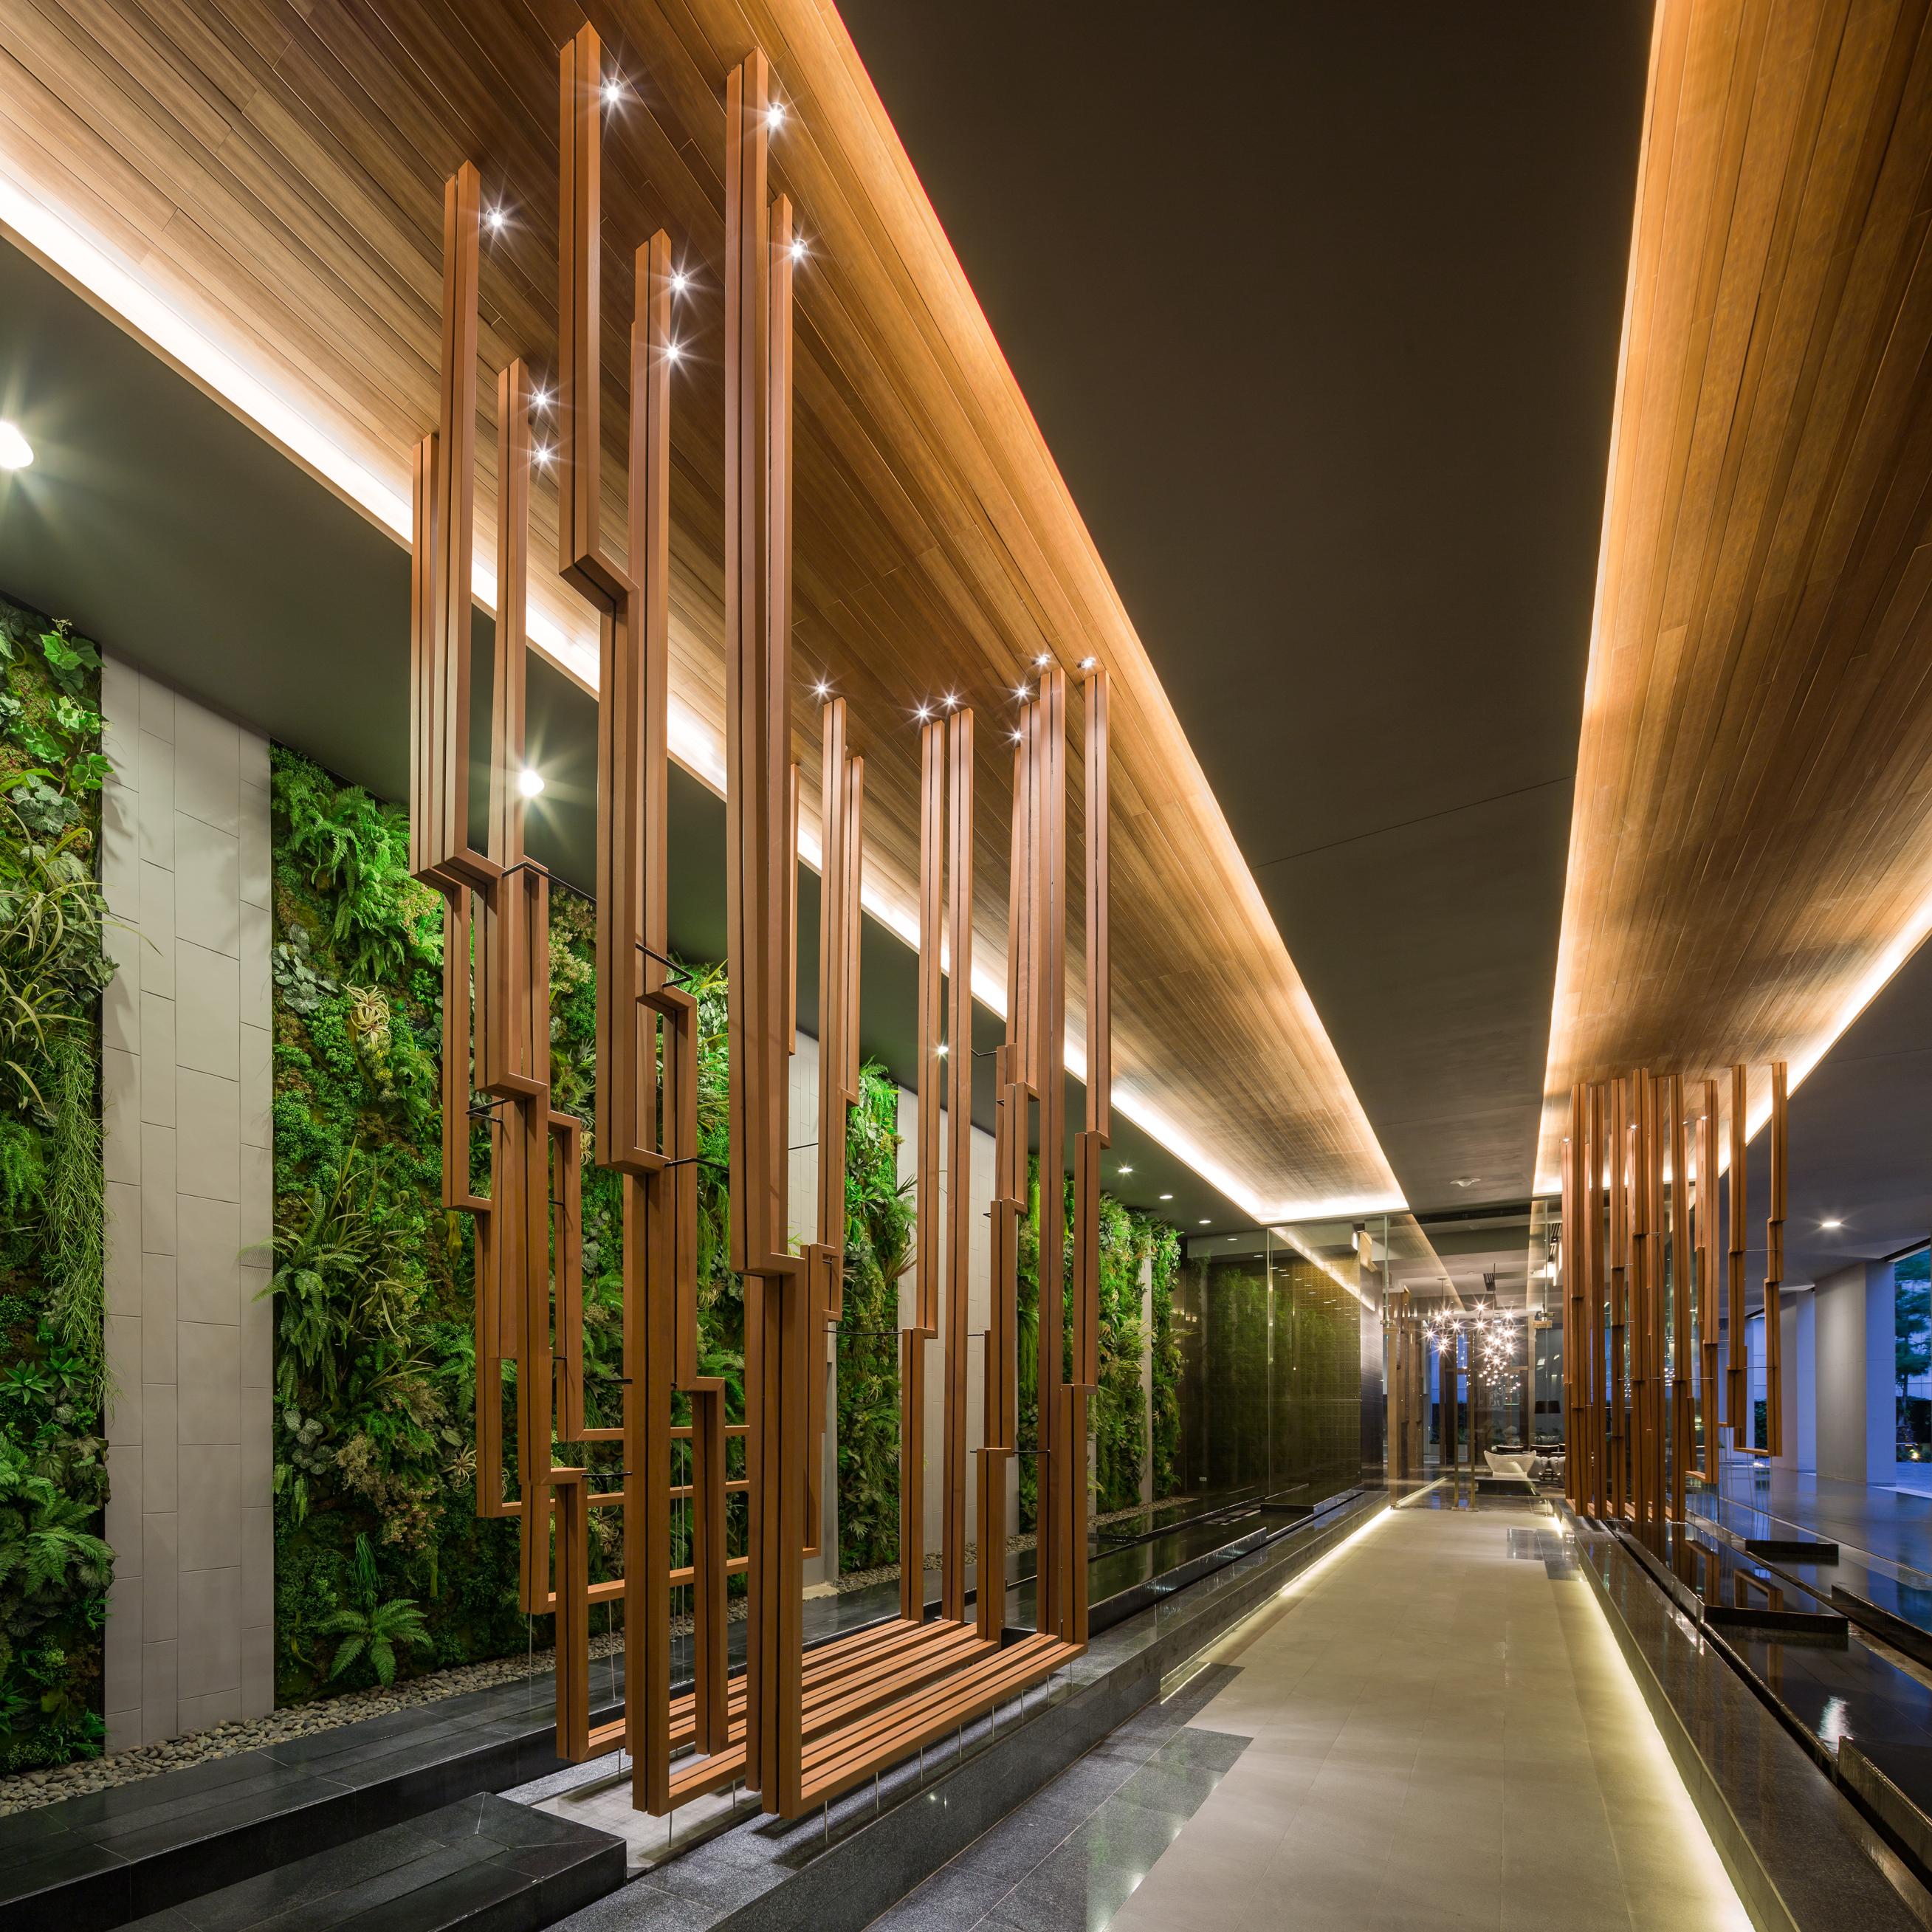 Shma hyde 16 wison tungthunya w workspace for W hotel bali interior design